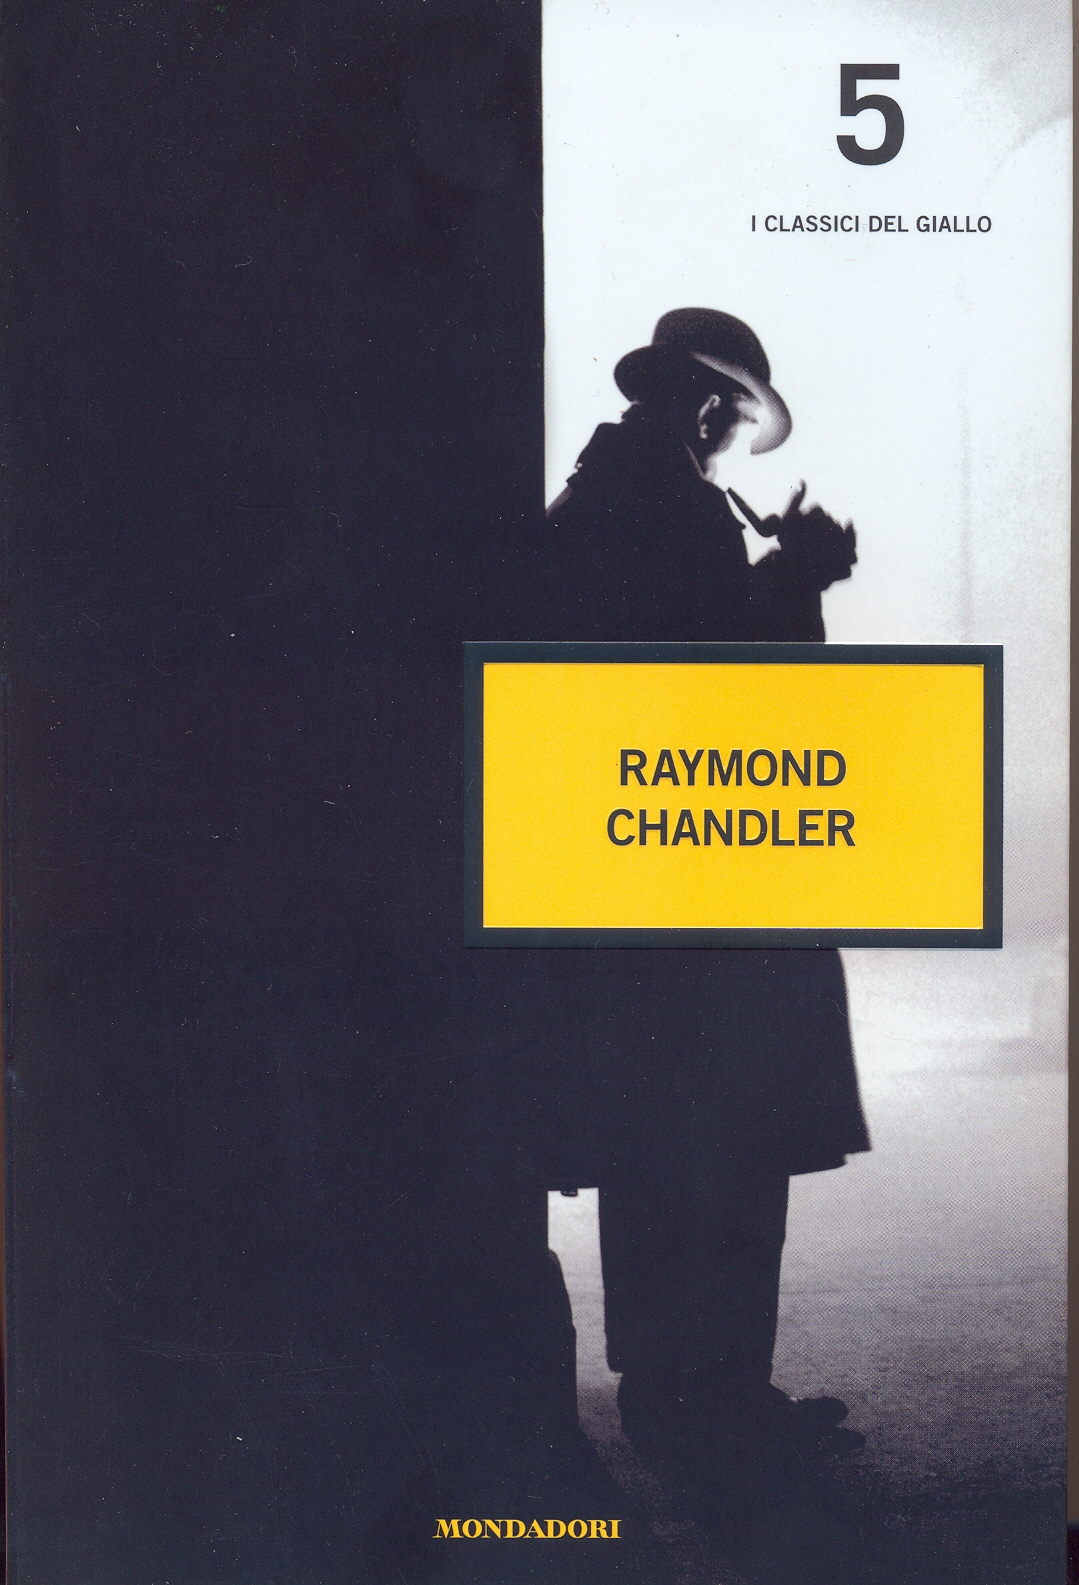 i classici del giallo 5: Raymond Chandler